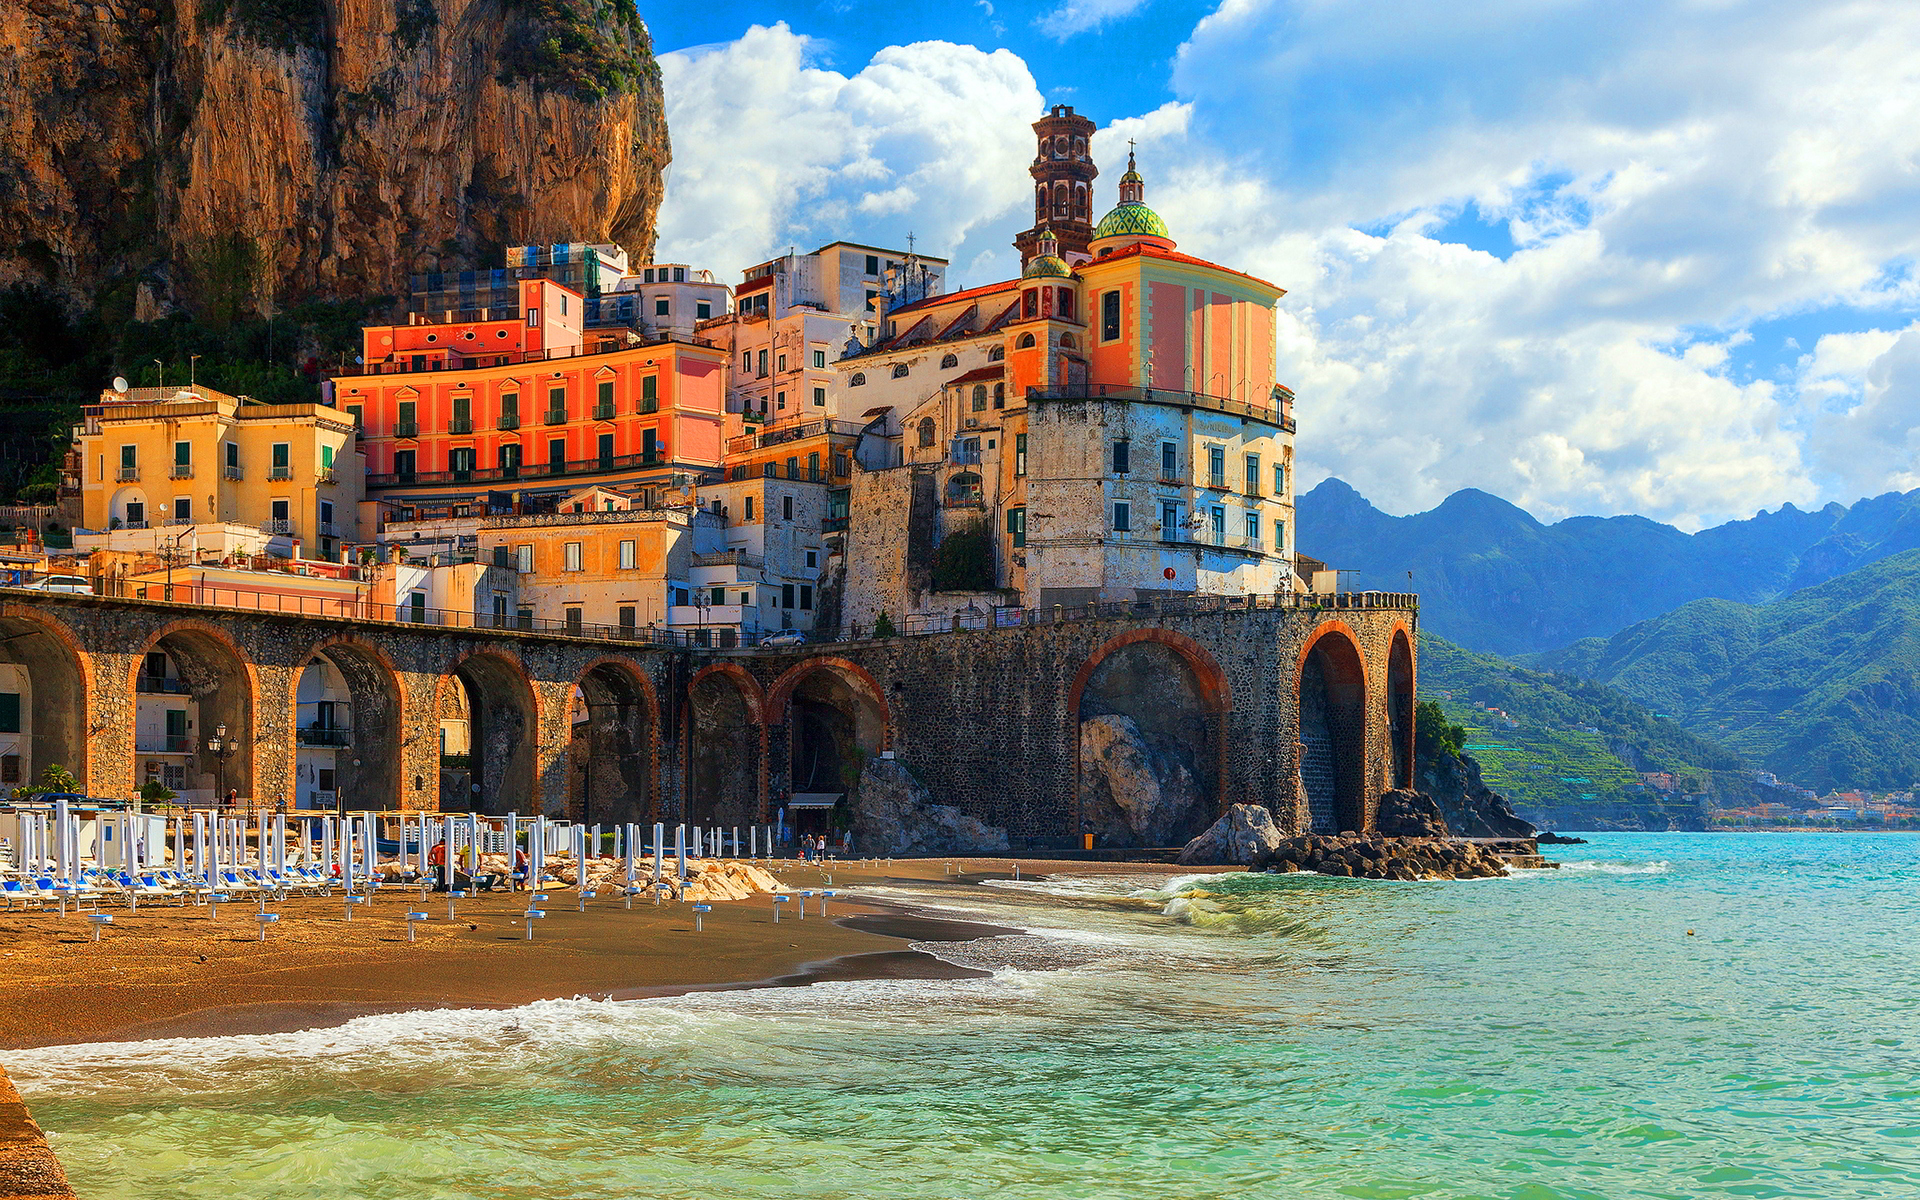 Anna Belle Elegant Resort Elegant Resort With Panoramic View In